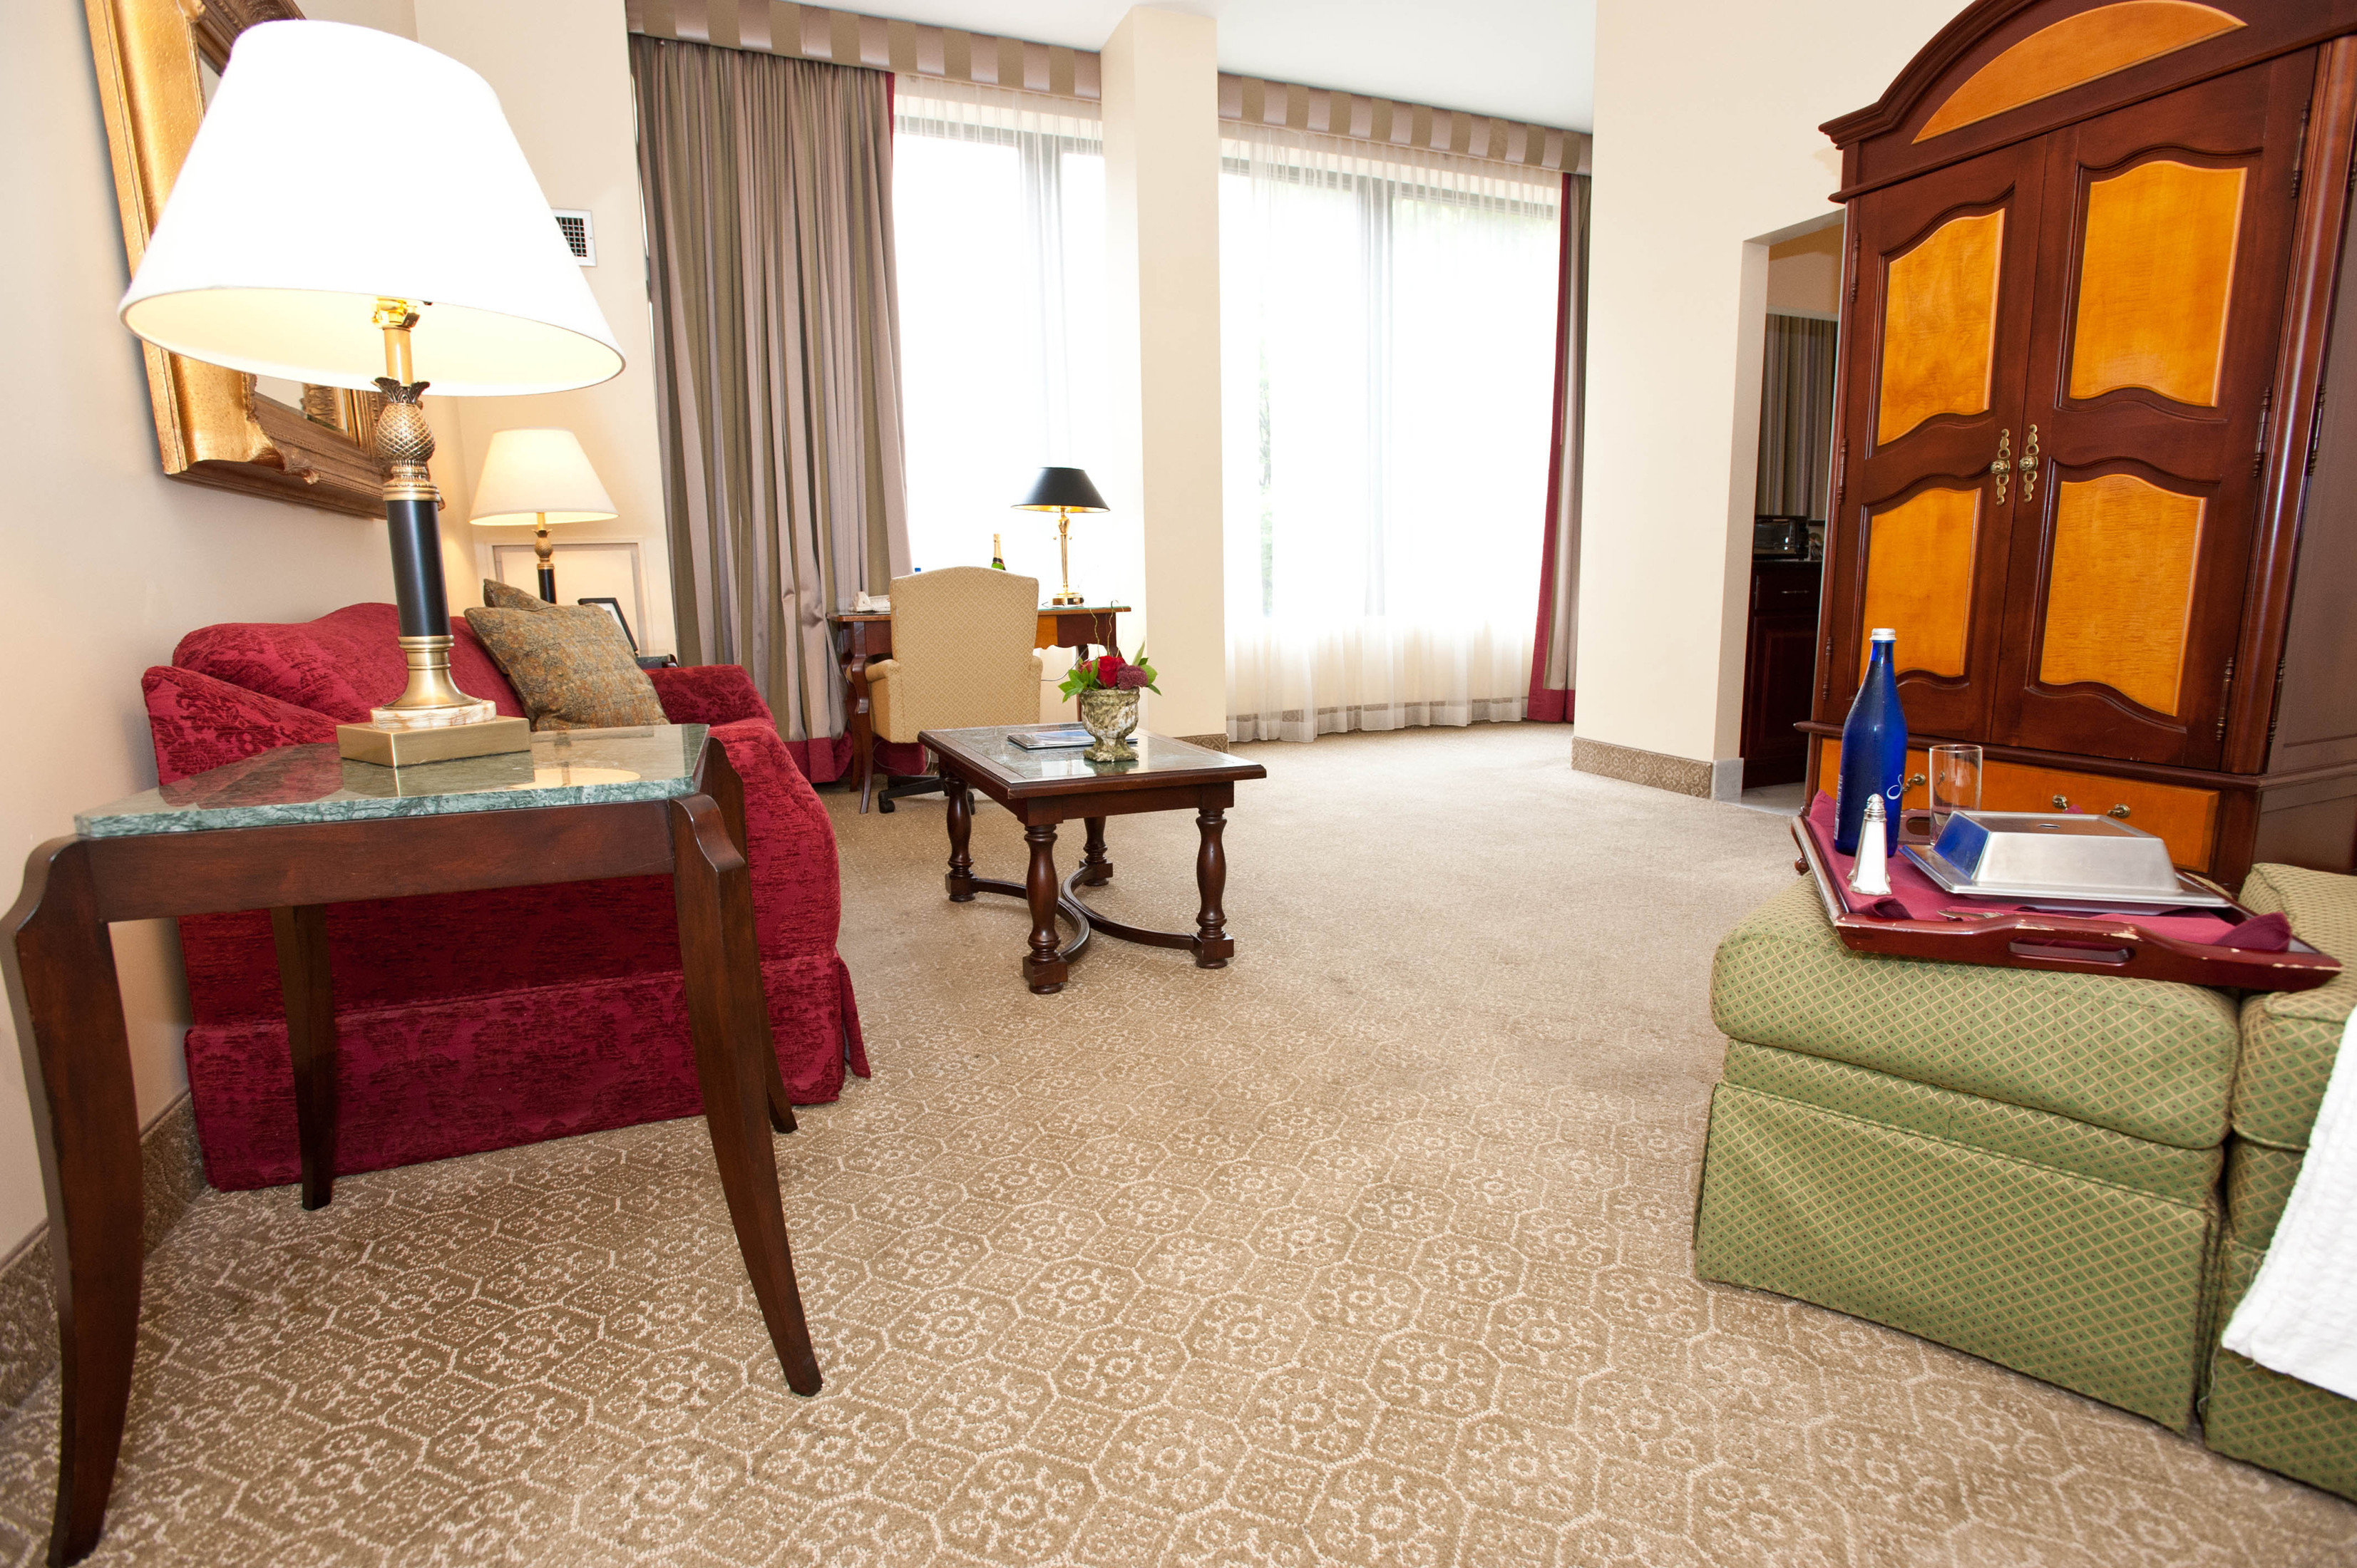 Boutique Classic Historic color chair property Suite home living room cottage Villa flooring